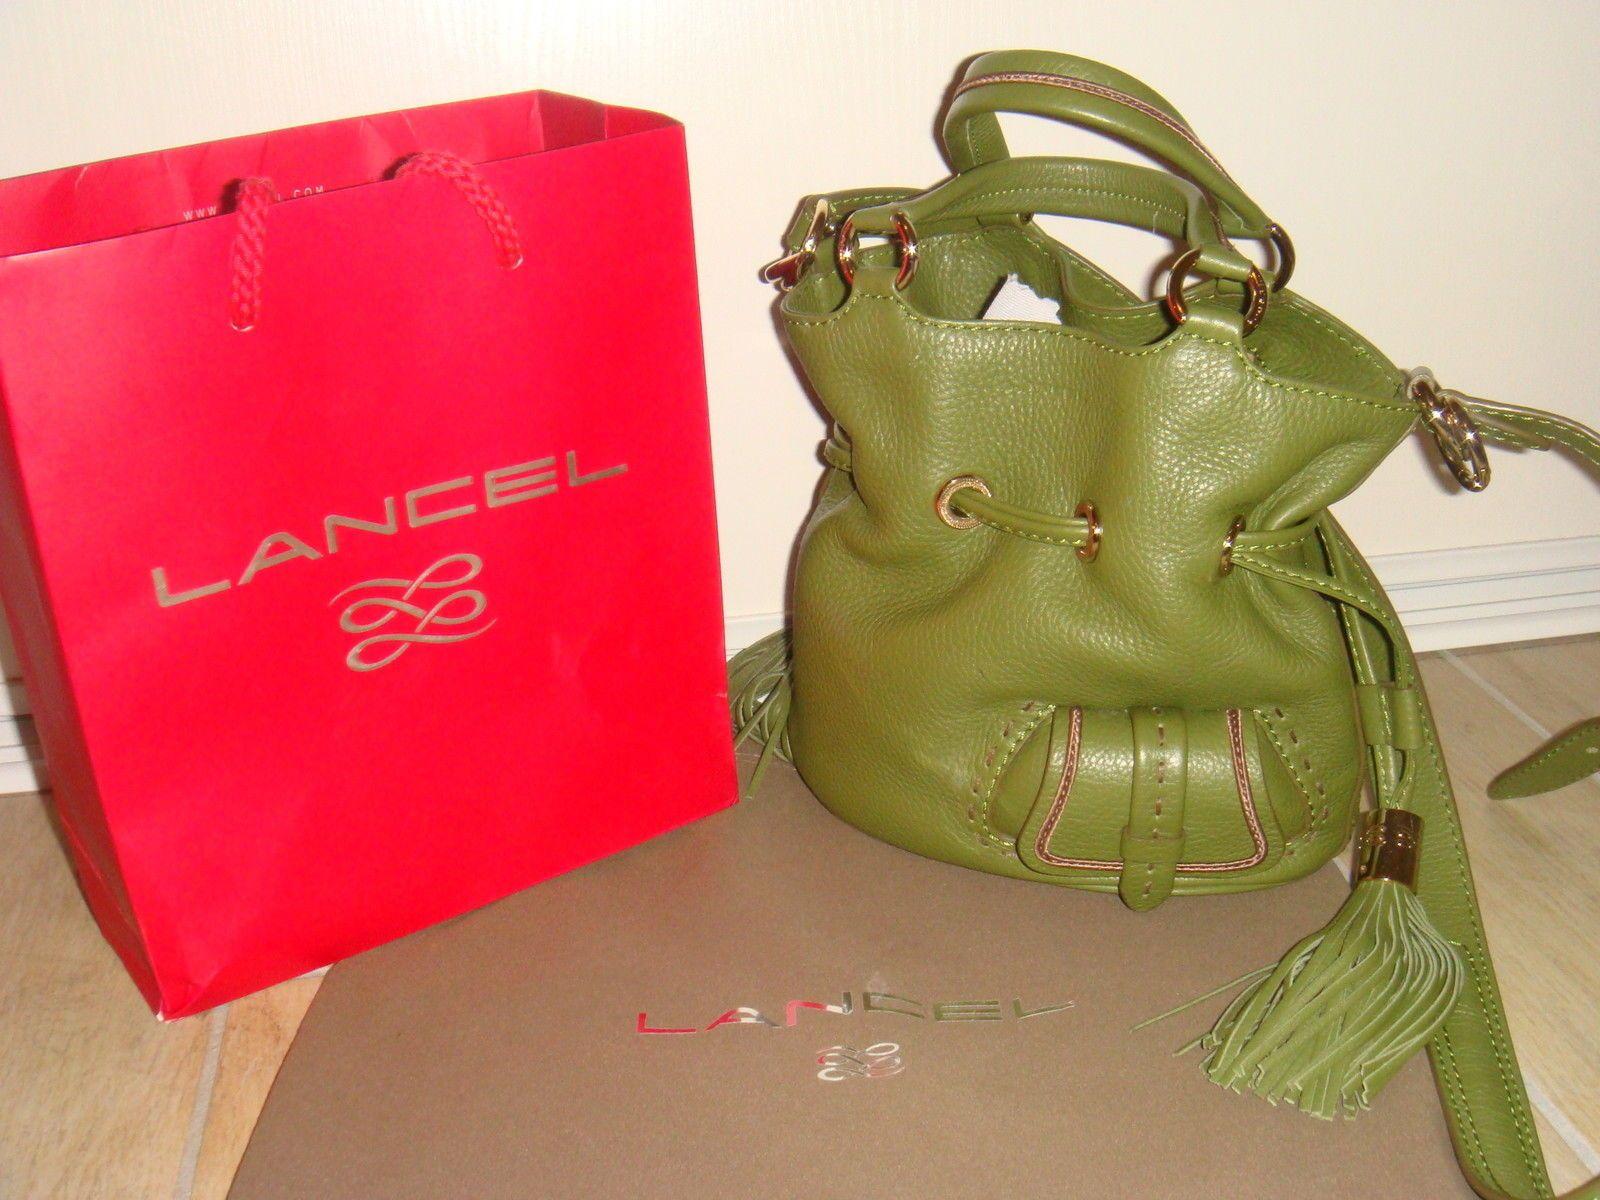 SAC Lancel 1ER Flirt Taille S EN Cuir Vert Petit Modele   eBay   sacs 381afa8d49b